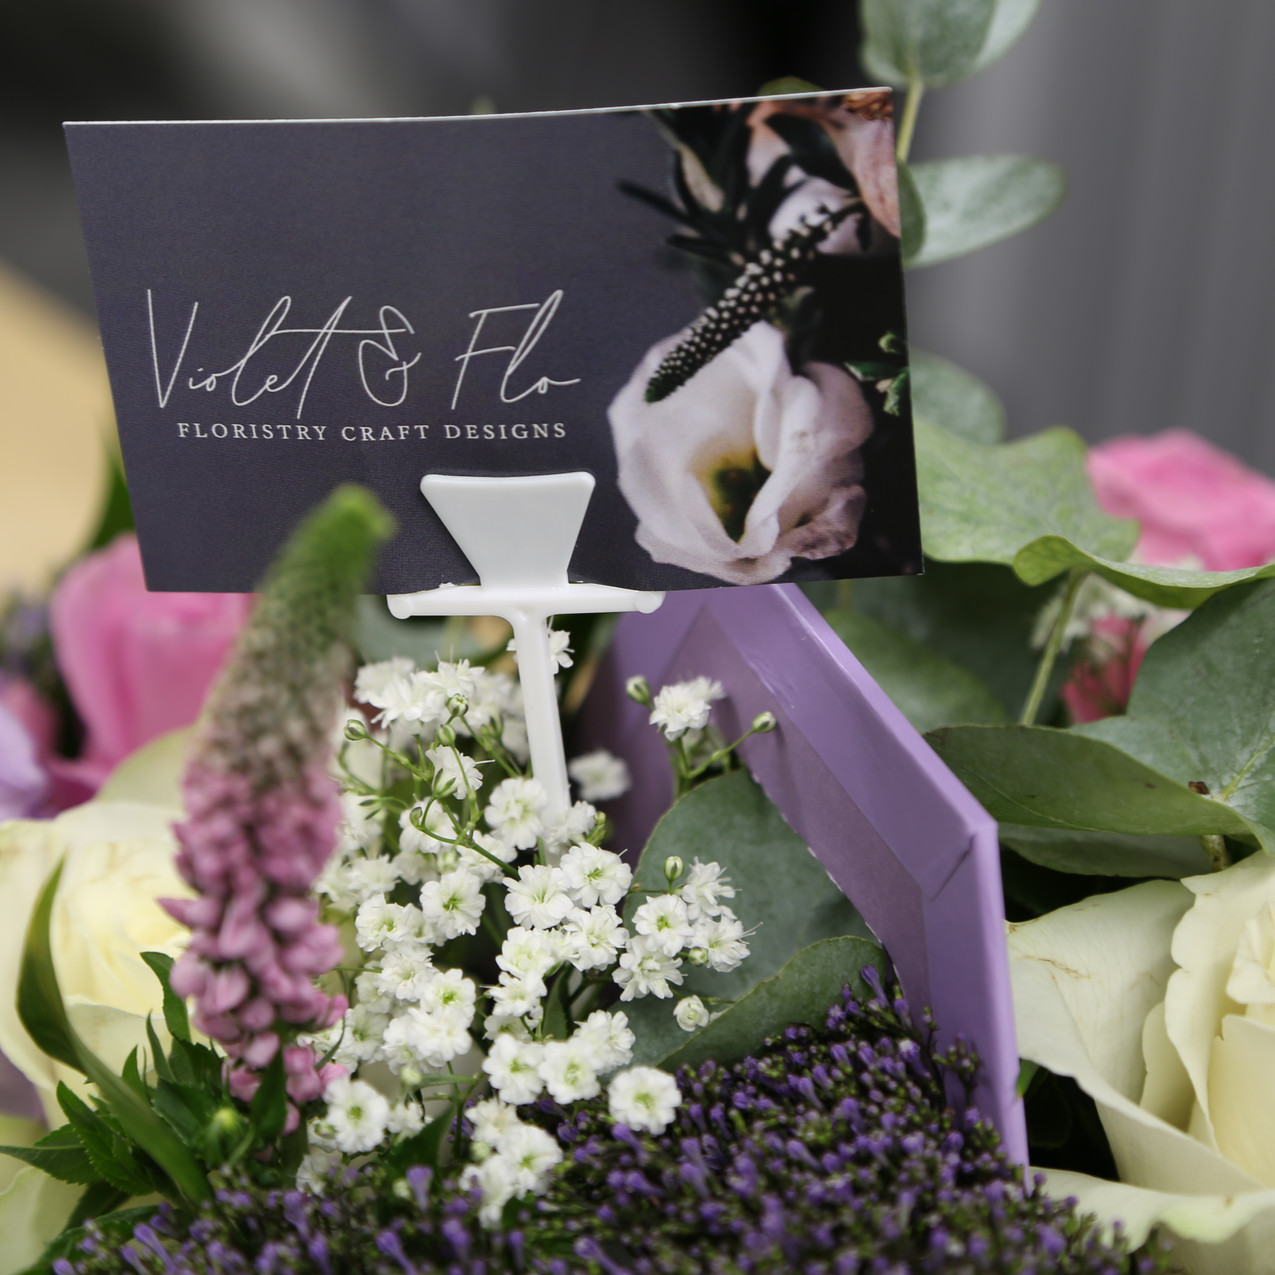 Florists designs